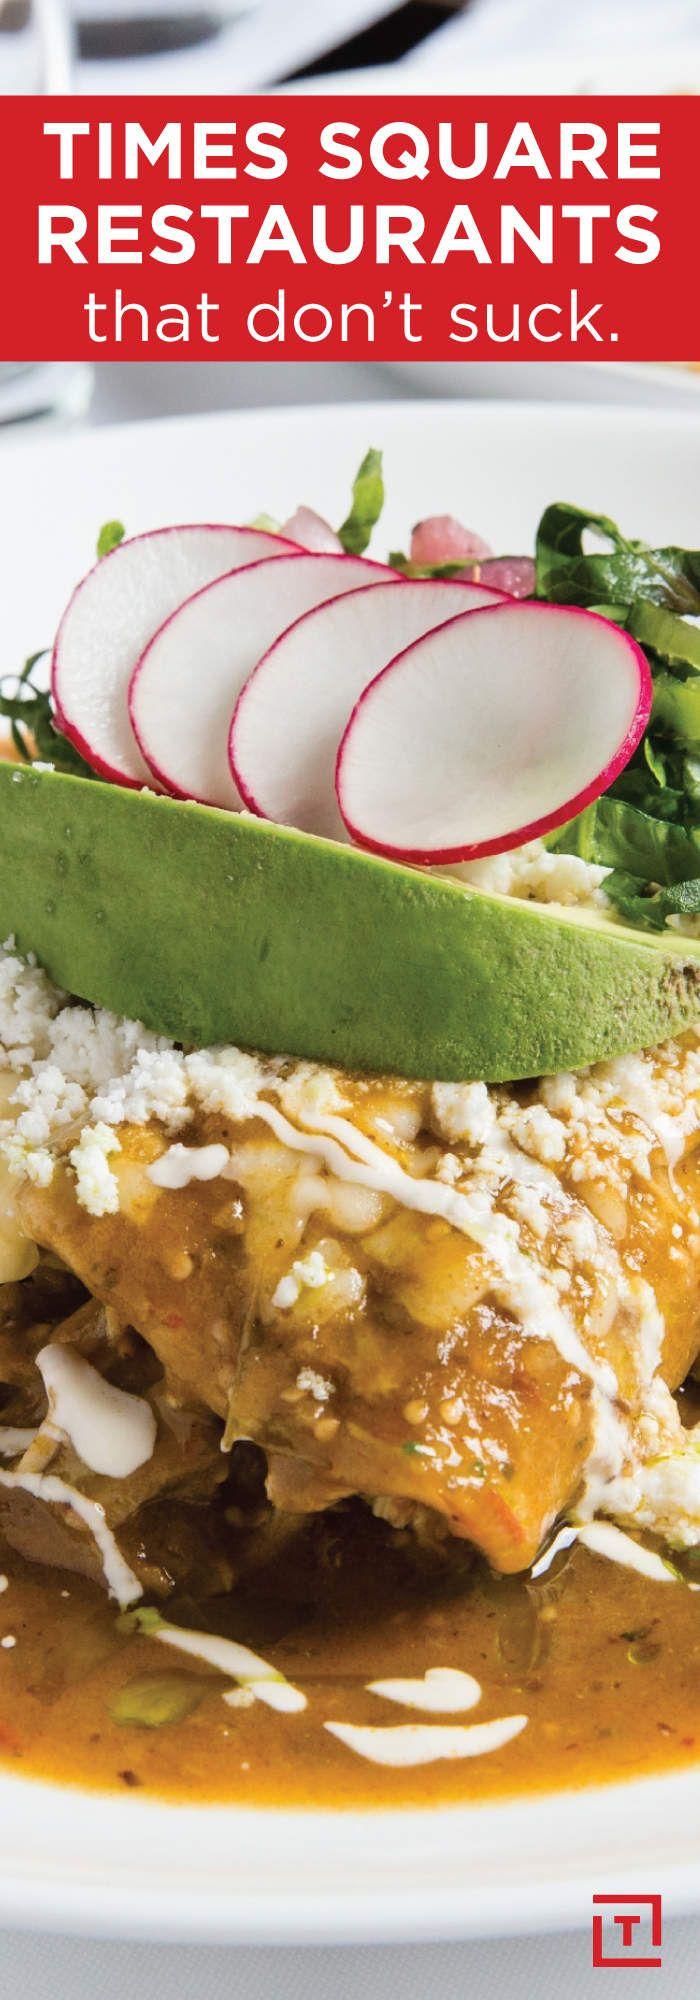 Best 25 Good restaurants in nyc ideas on Pinterest Nyc